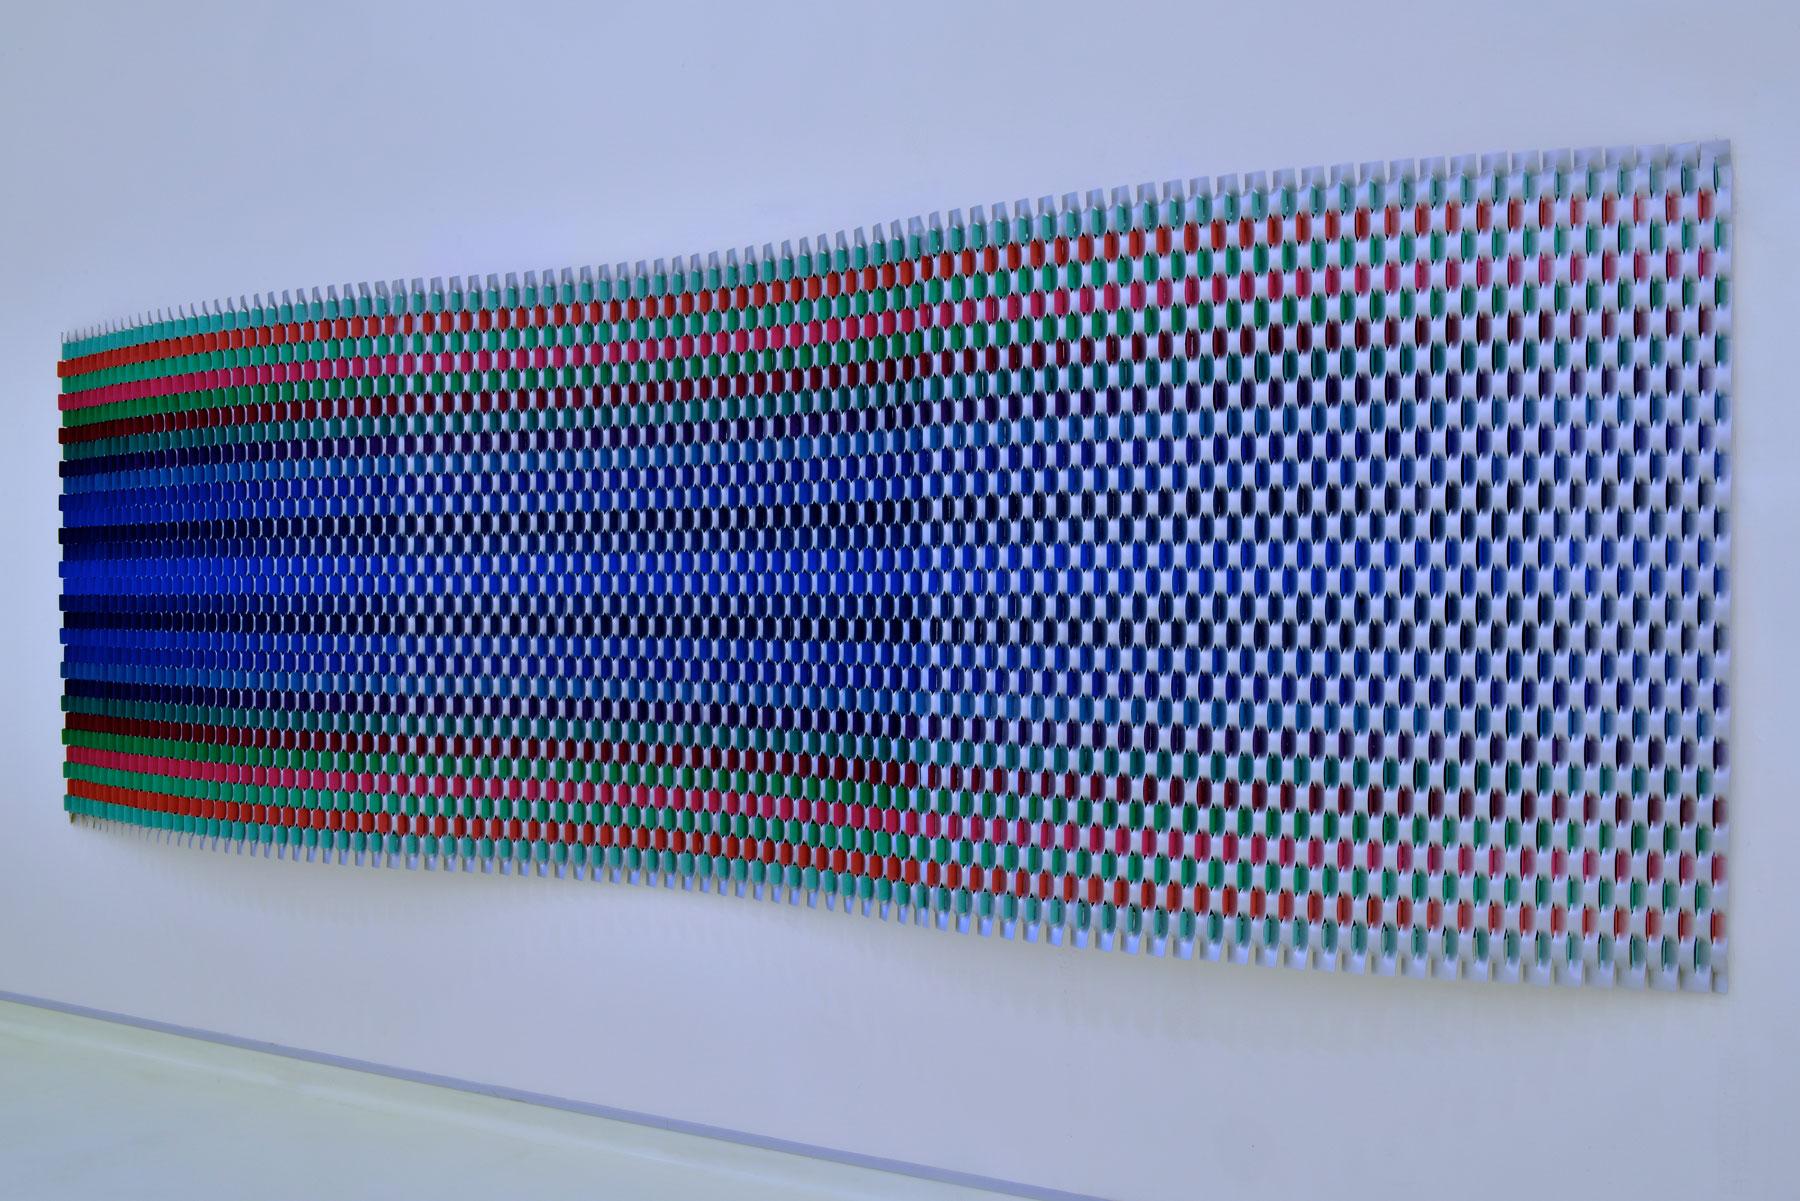 colourful installation rashid khalifa